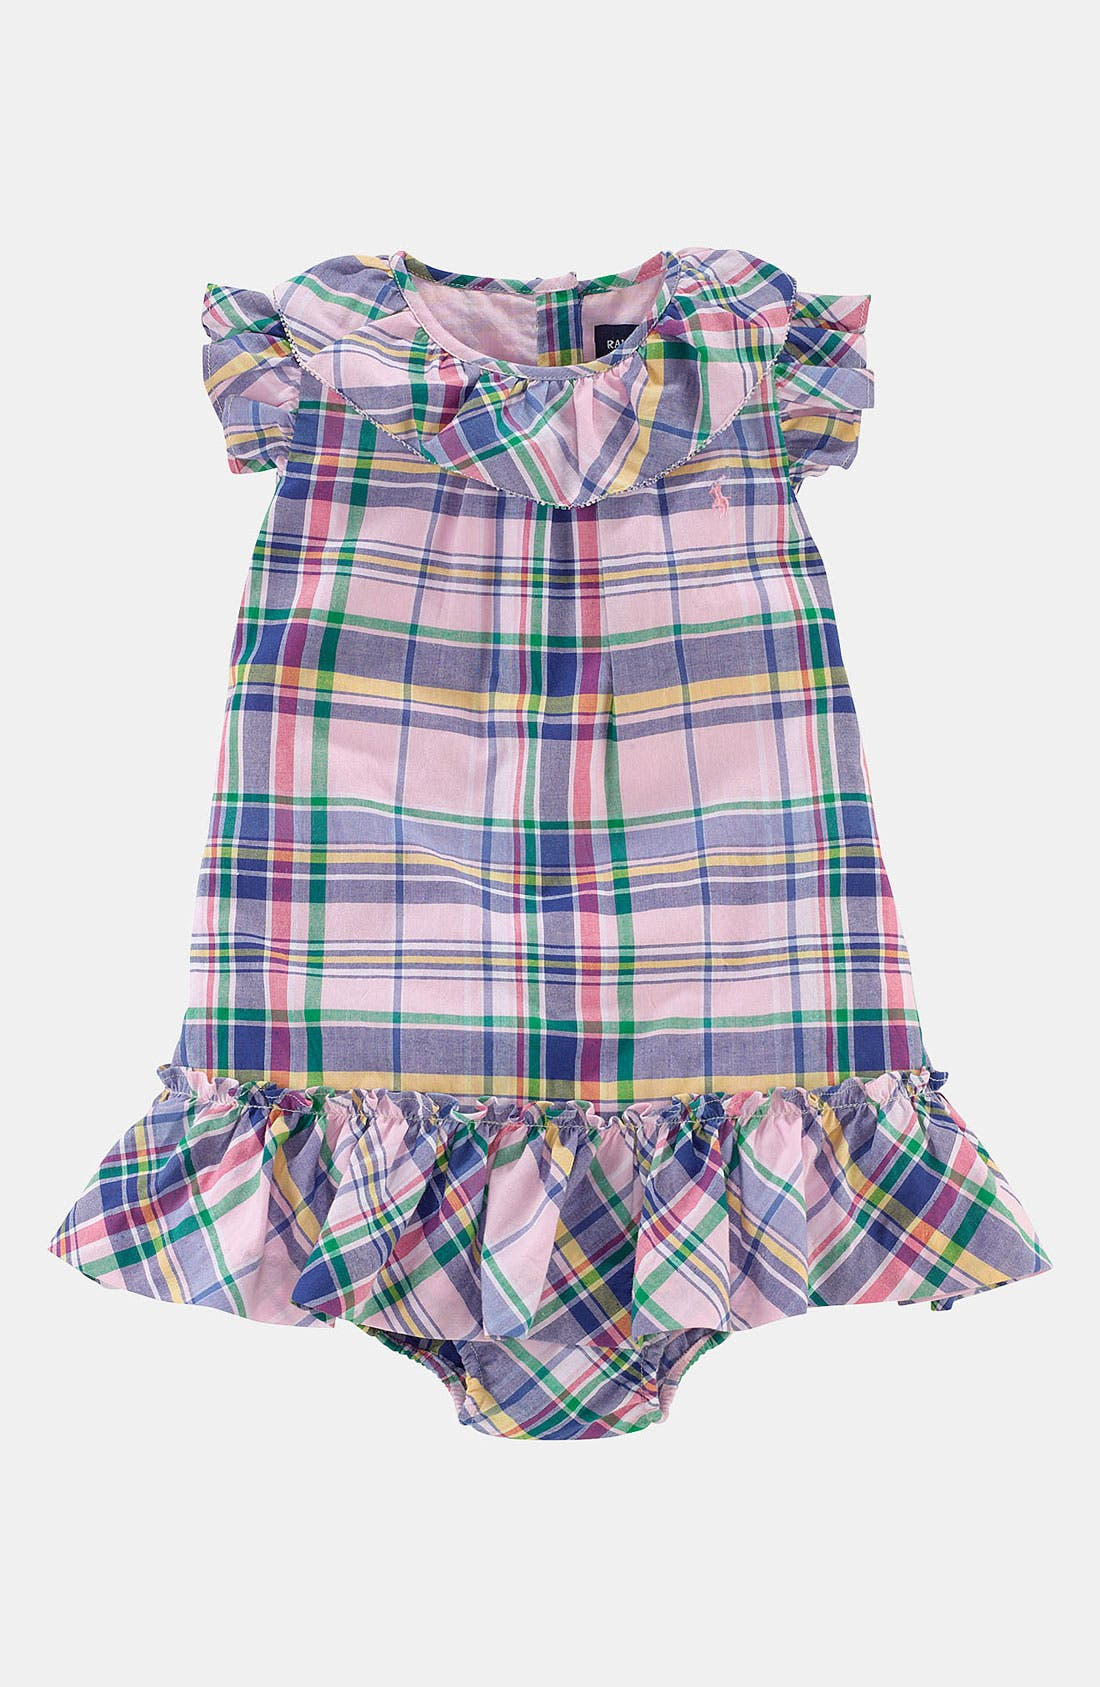 Alternate Image 1 Selected - Ralph Lauren Madras Plaid Dress (Baby)